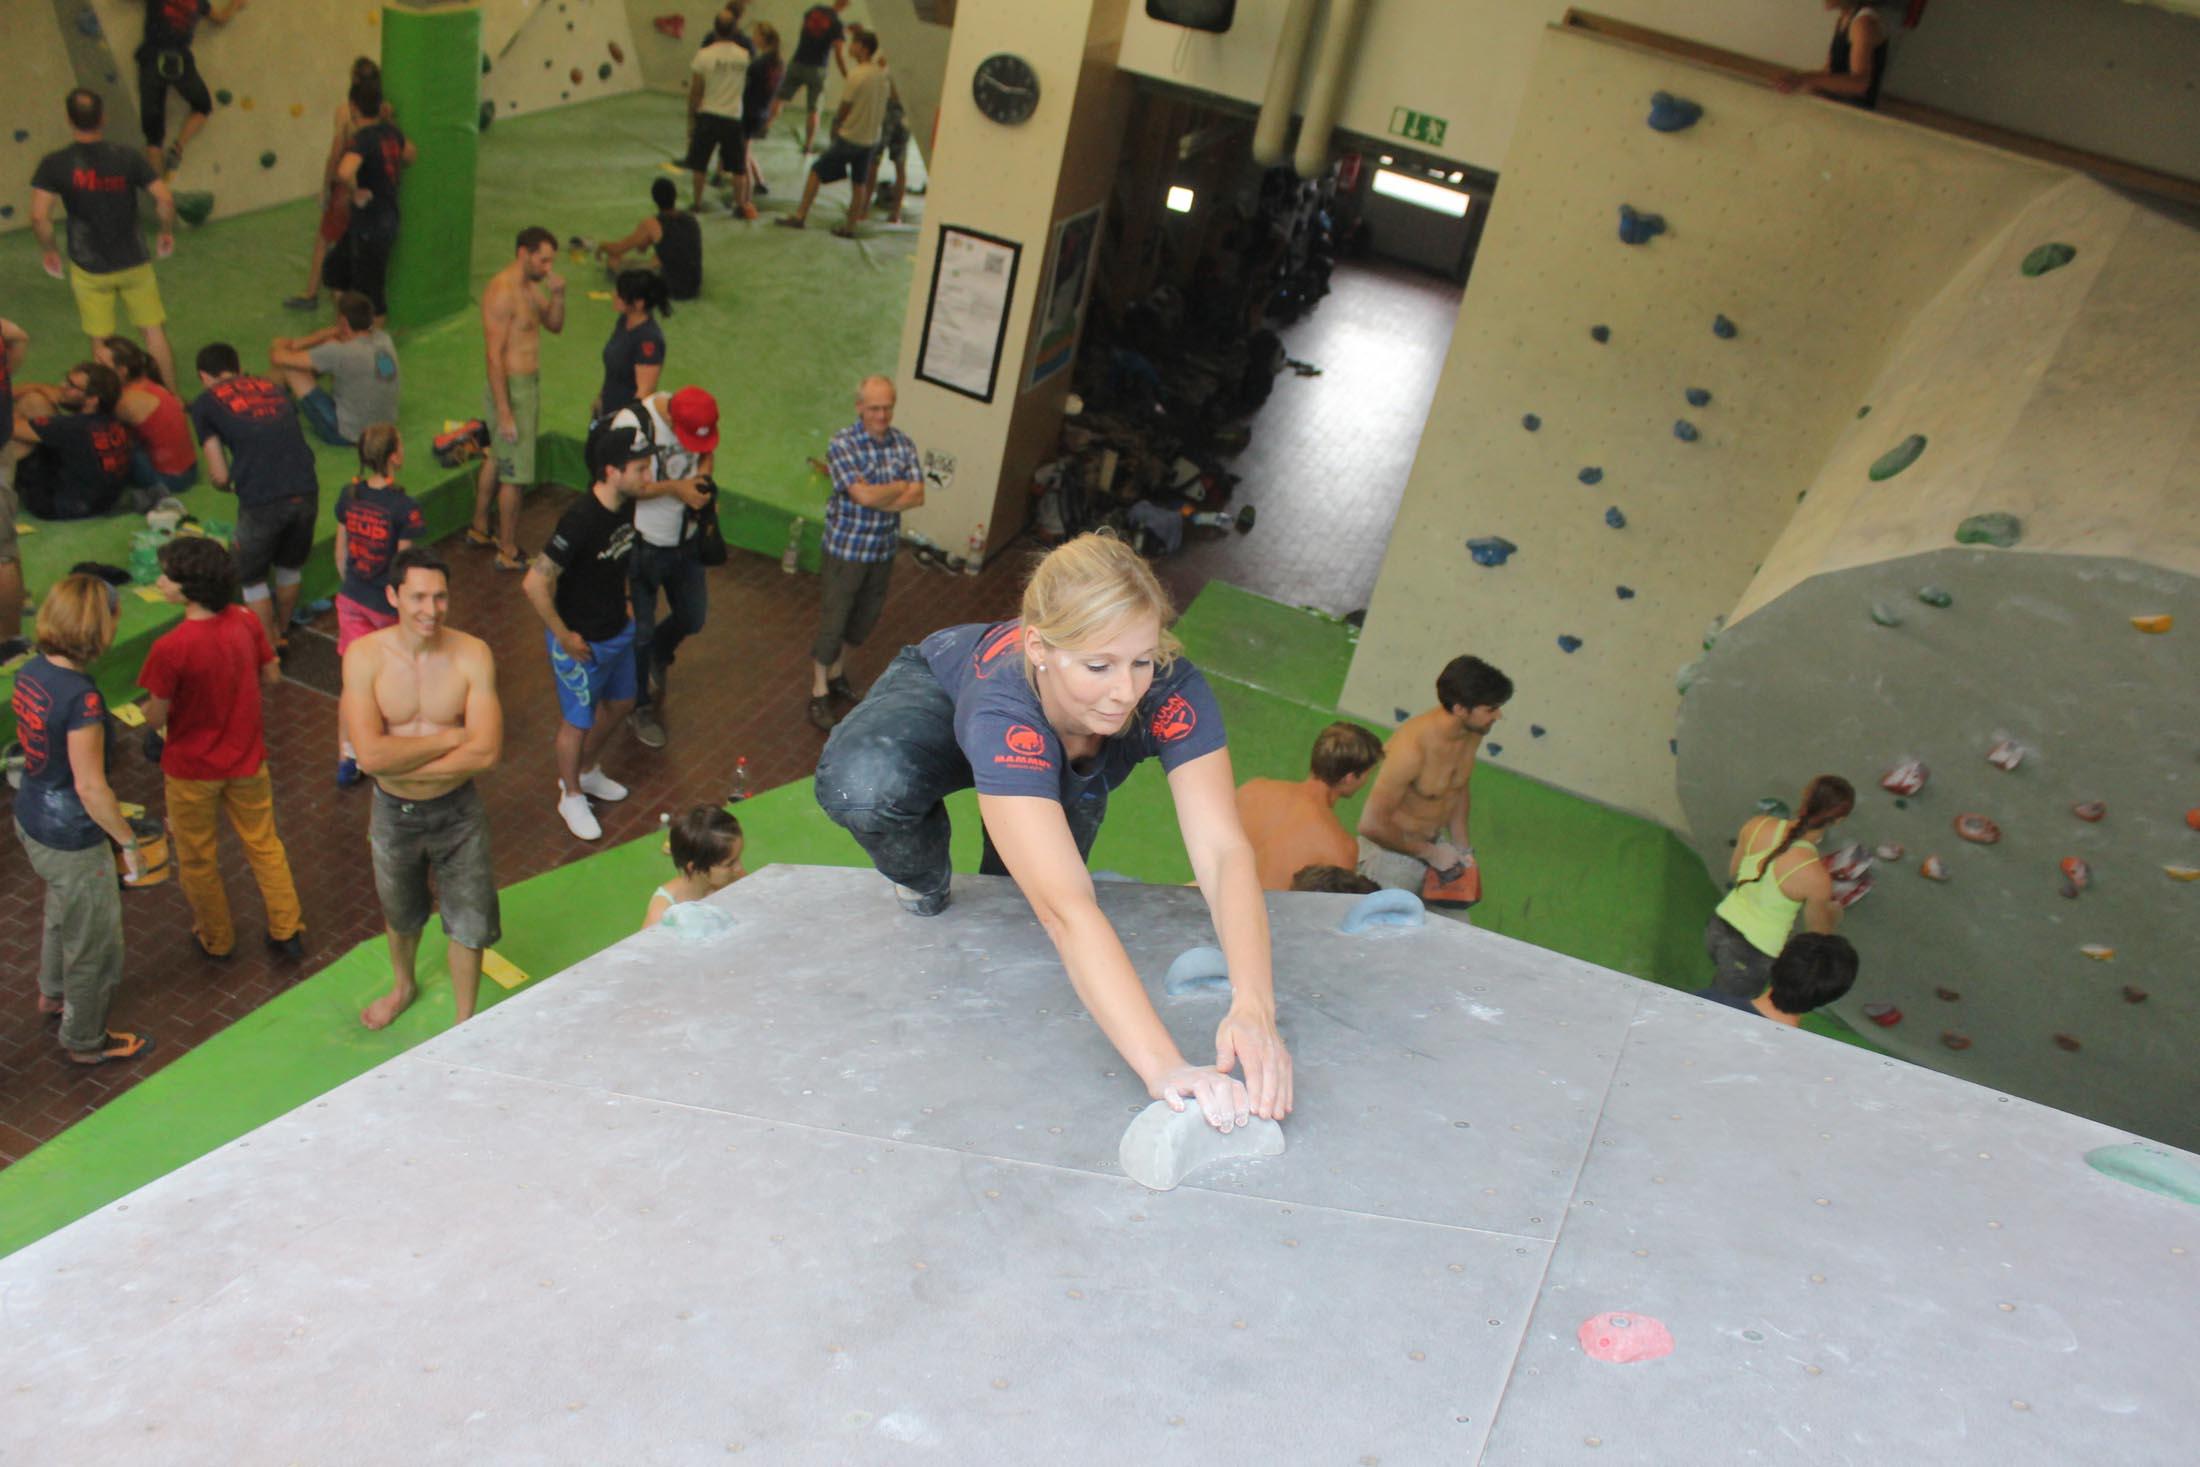 Quali, internationaler bouldercup Frankenjura 2016, BLOCKHELDEN Erlangen, Mammut, Bergfreunde.de, Boulderwettkampf07092016300